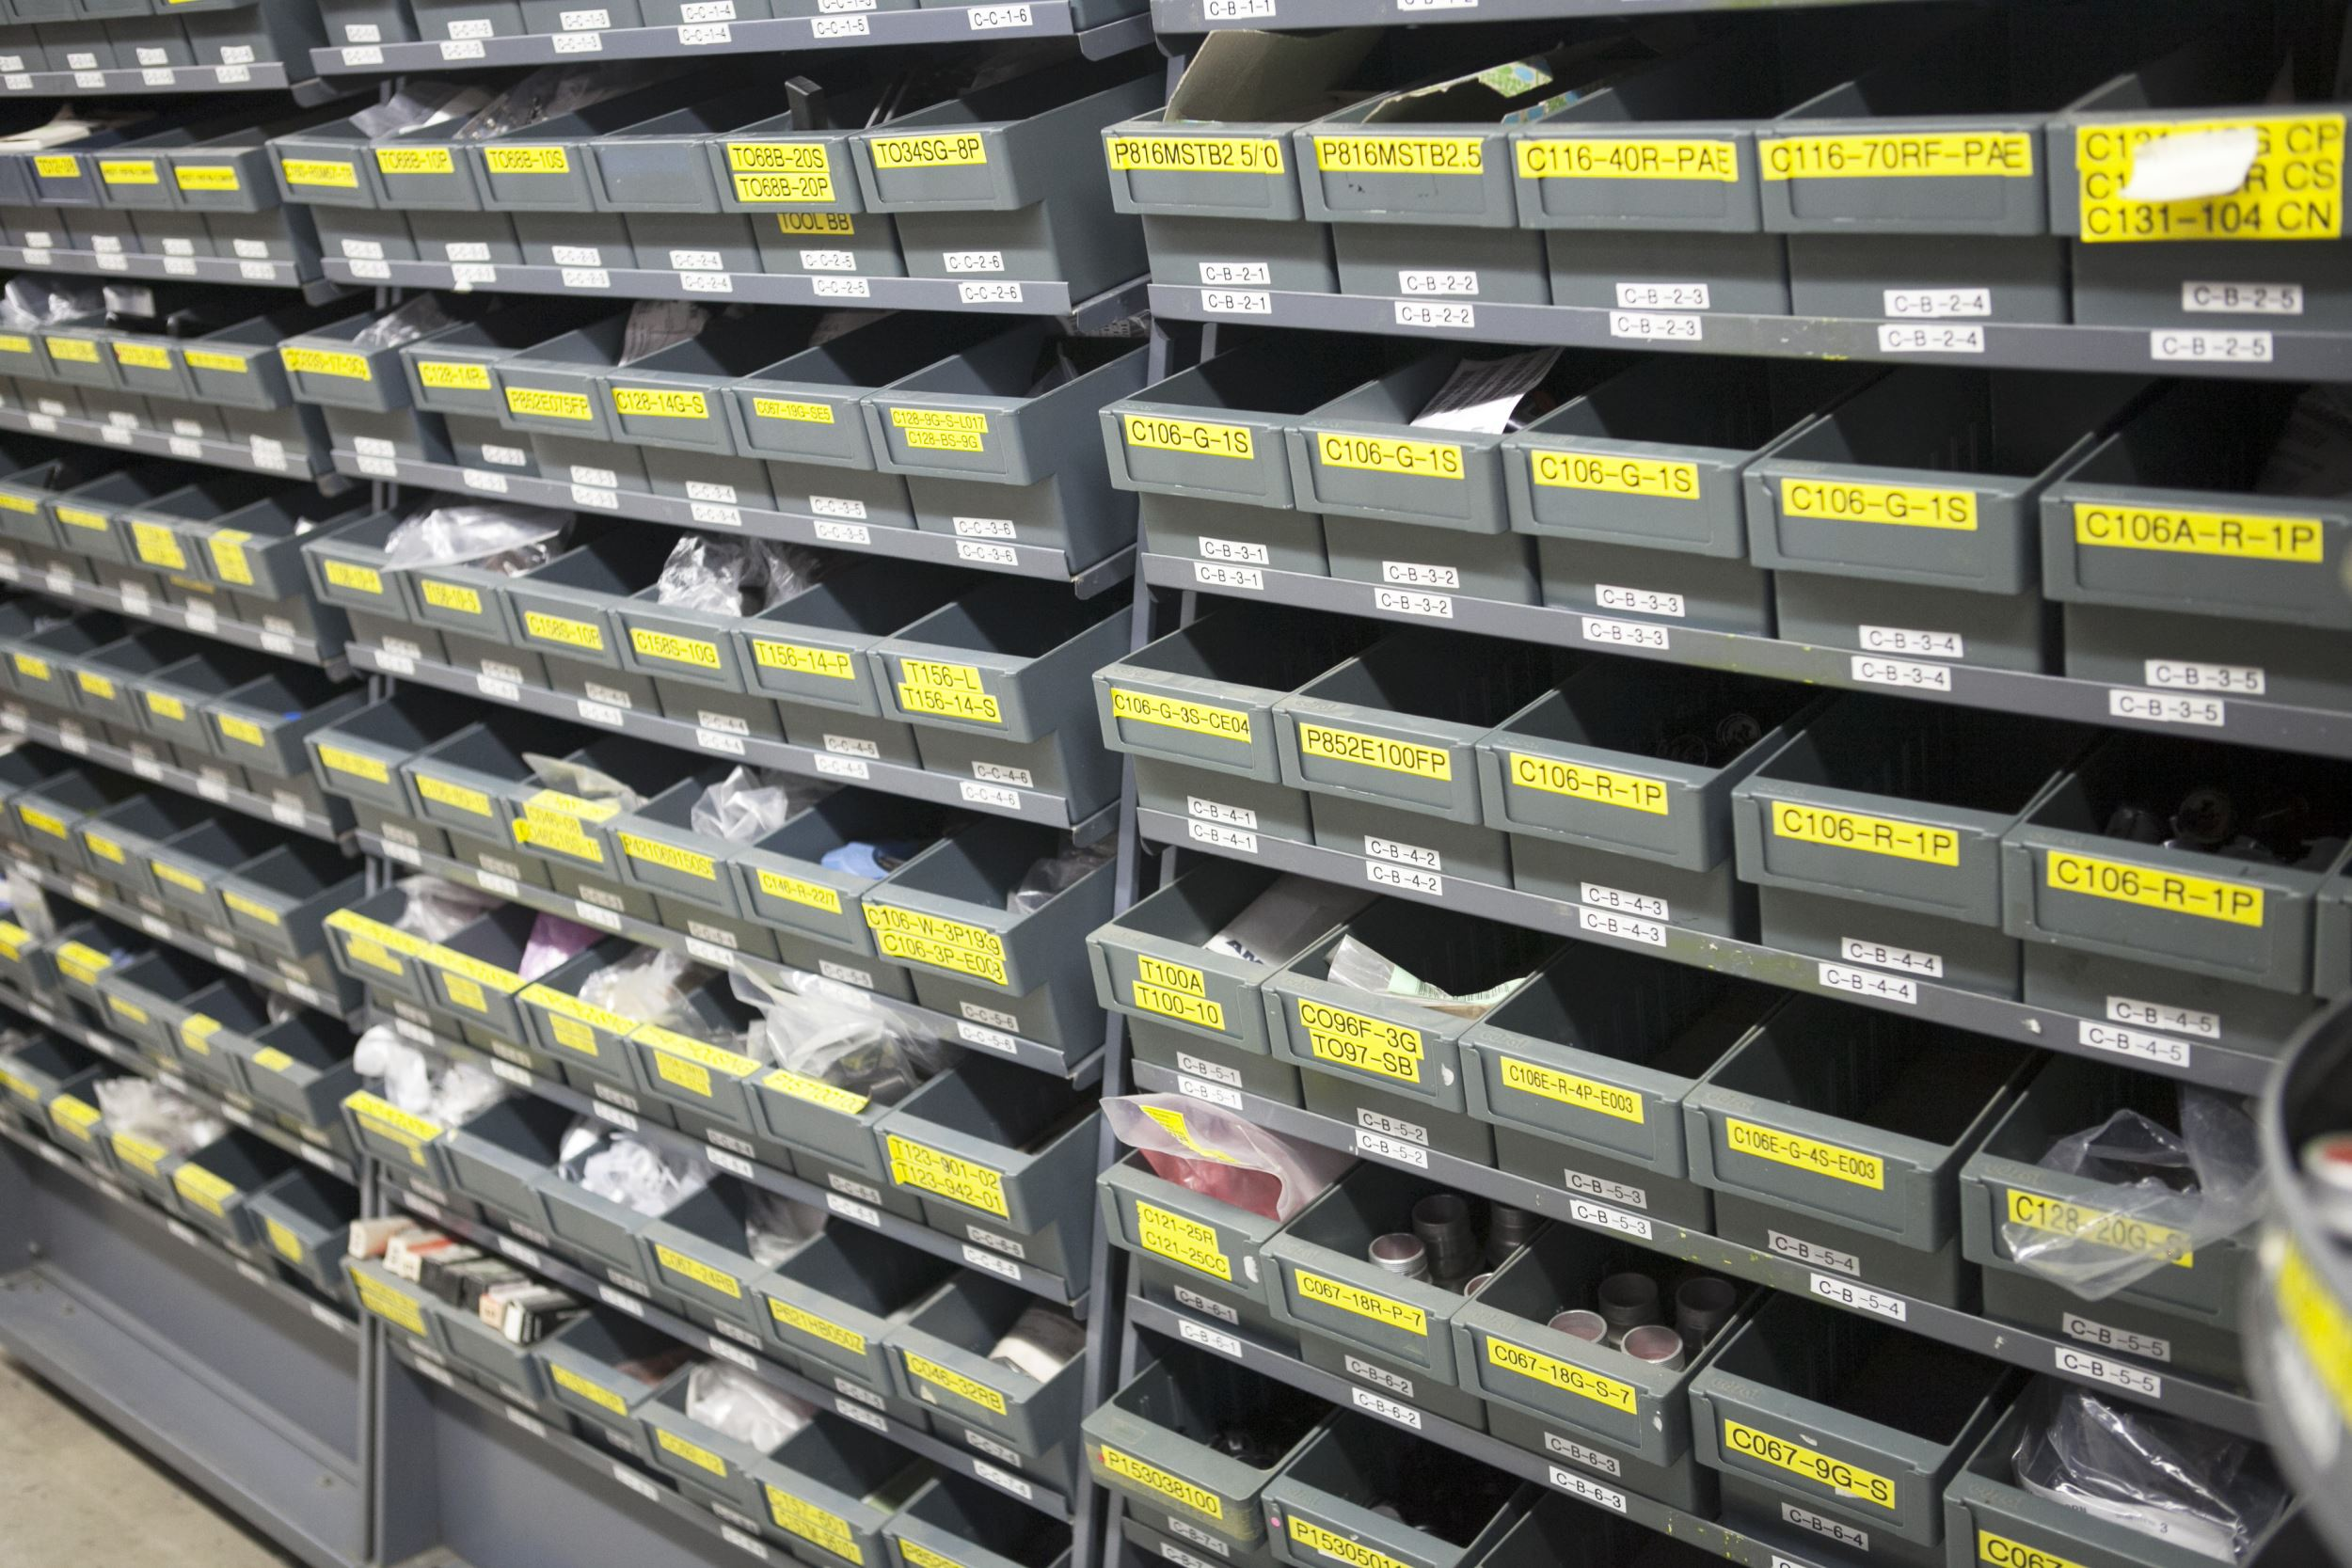 United Equipment Accessories completes audit